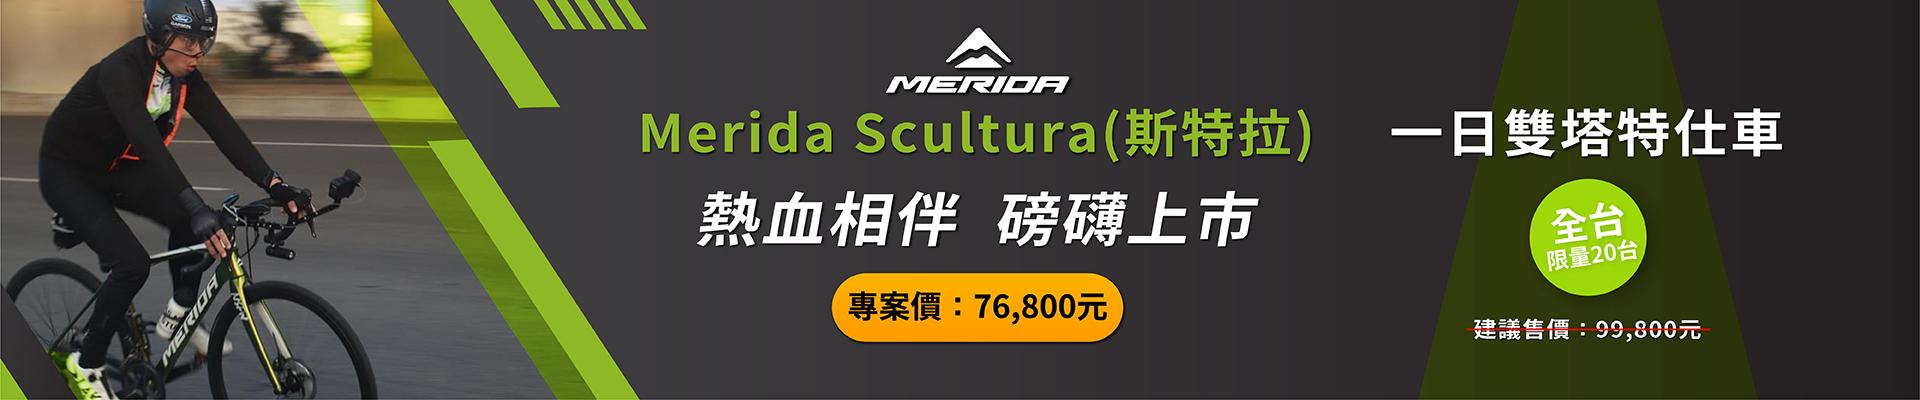 Merida 美利達 Scultura(斯特拉)一日雙塔特仕車-主視覺